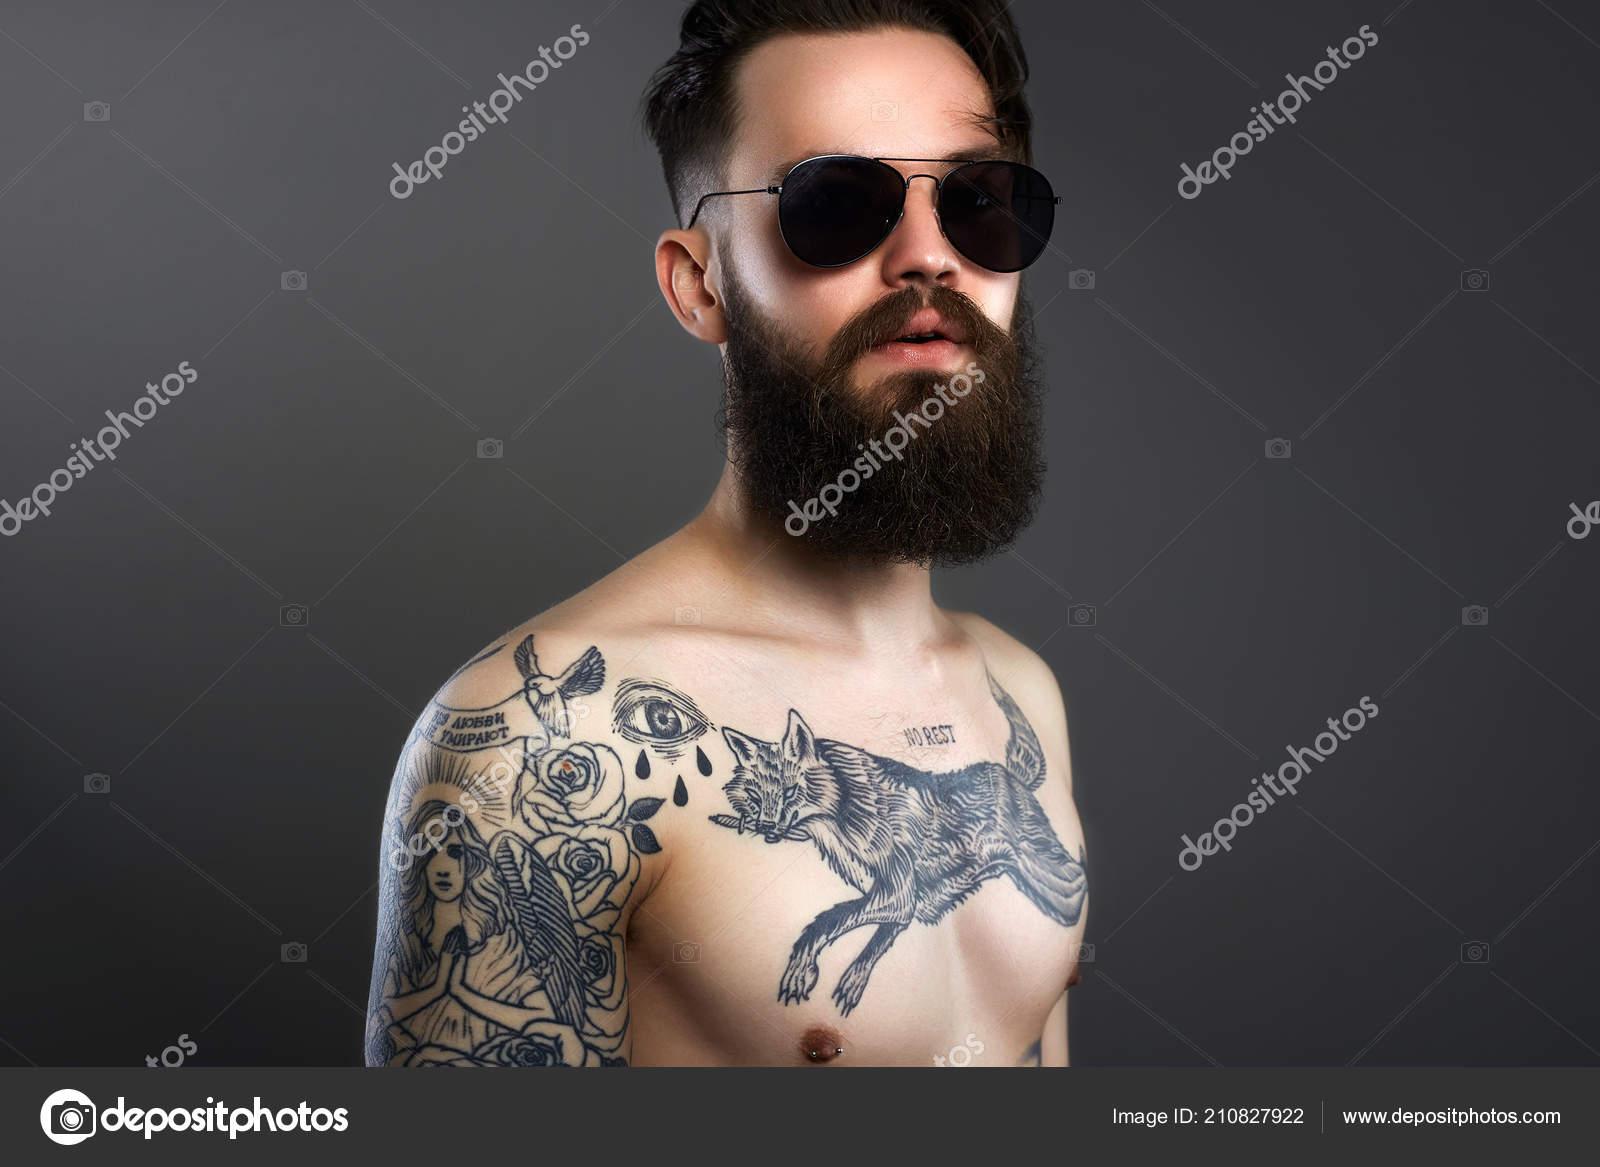 Hombre Guapo Con Barba Gafas Sol Cuerpo Hombre Joven Desnudo — Foto ... 652c76062b1